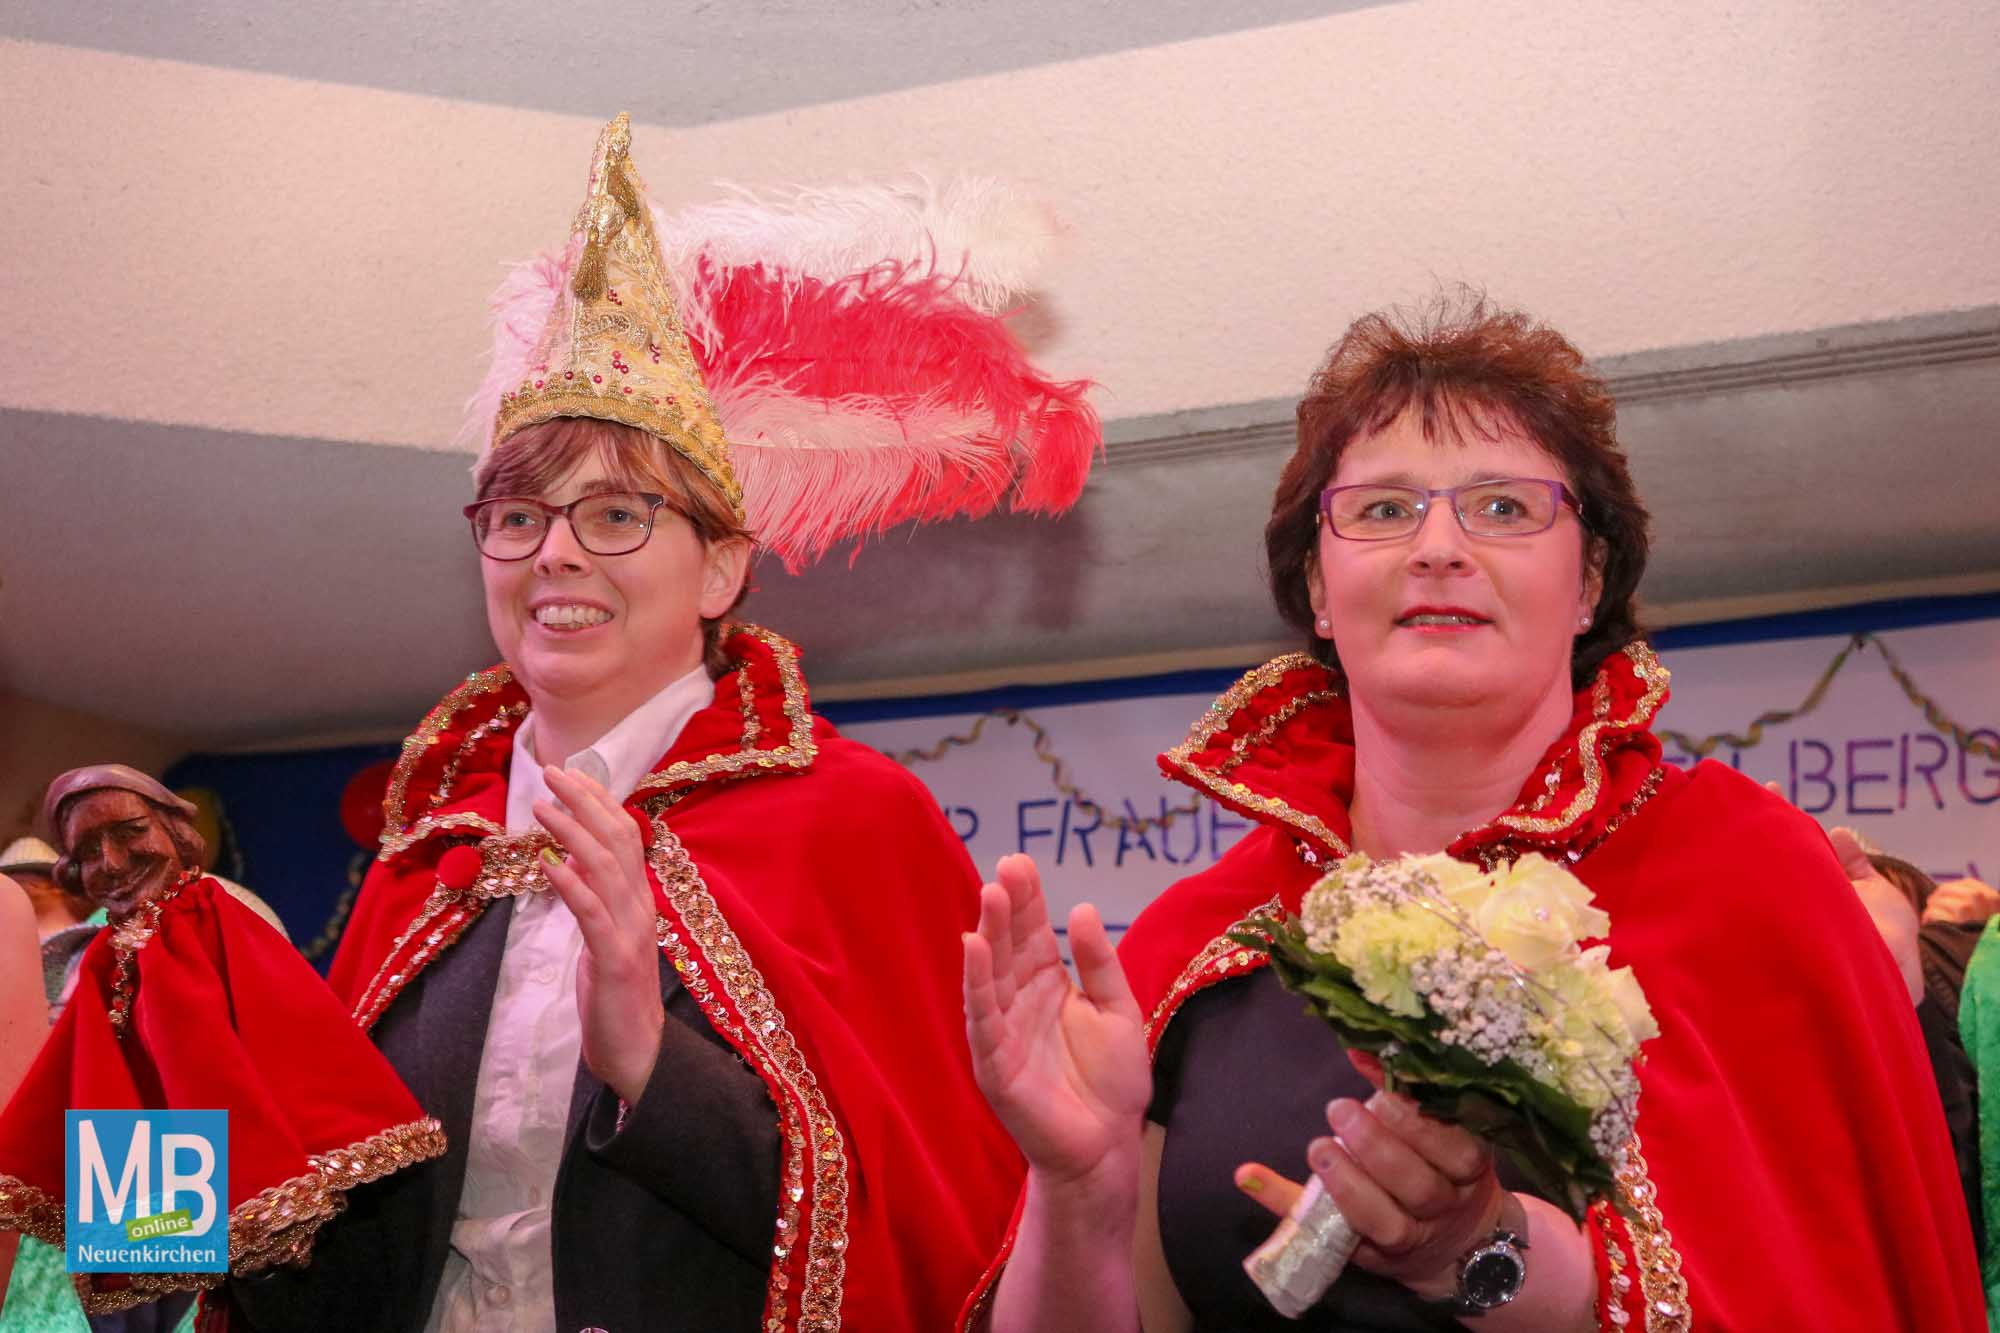 Frauenkarneval 2018